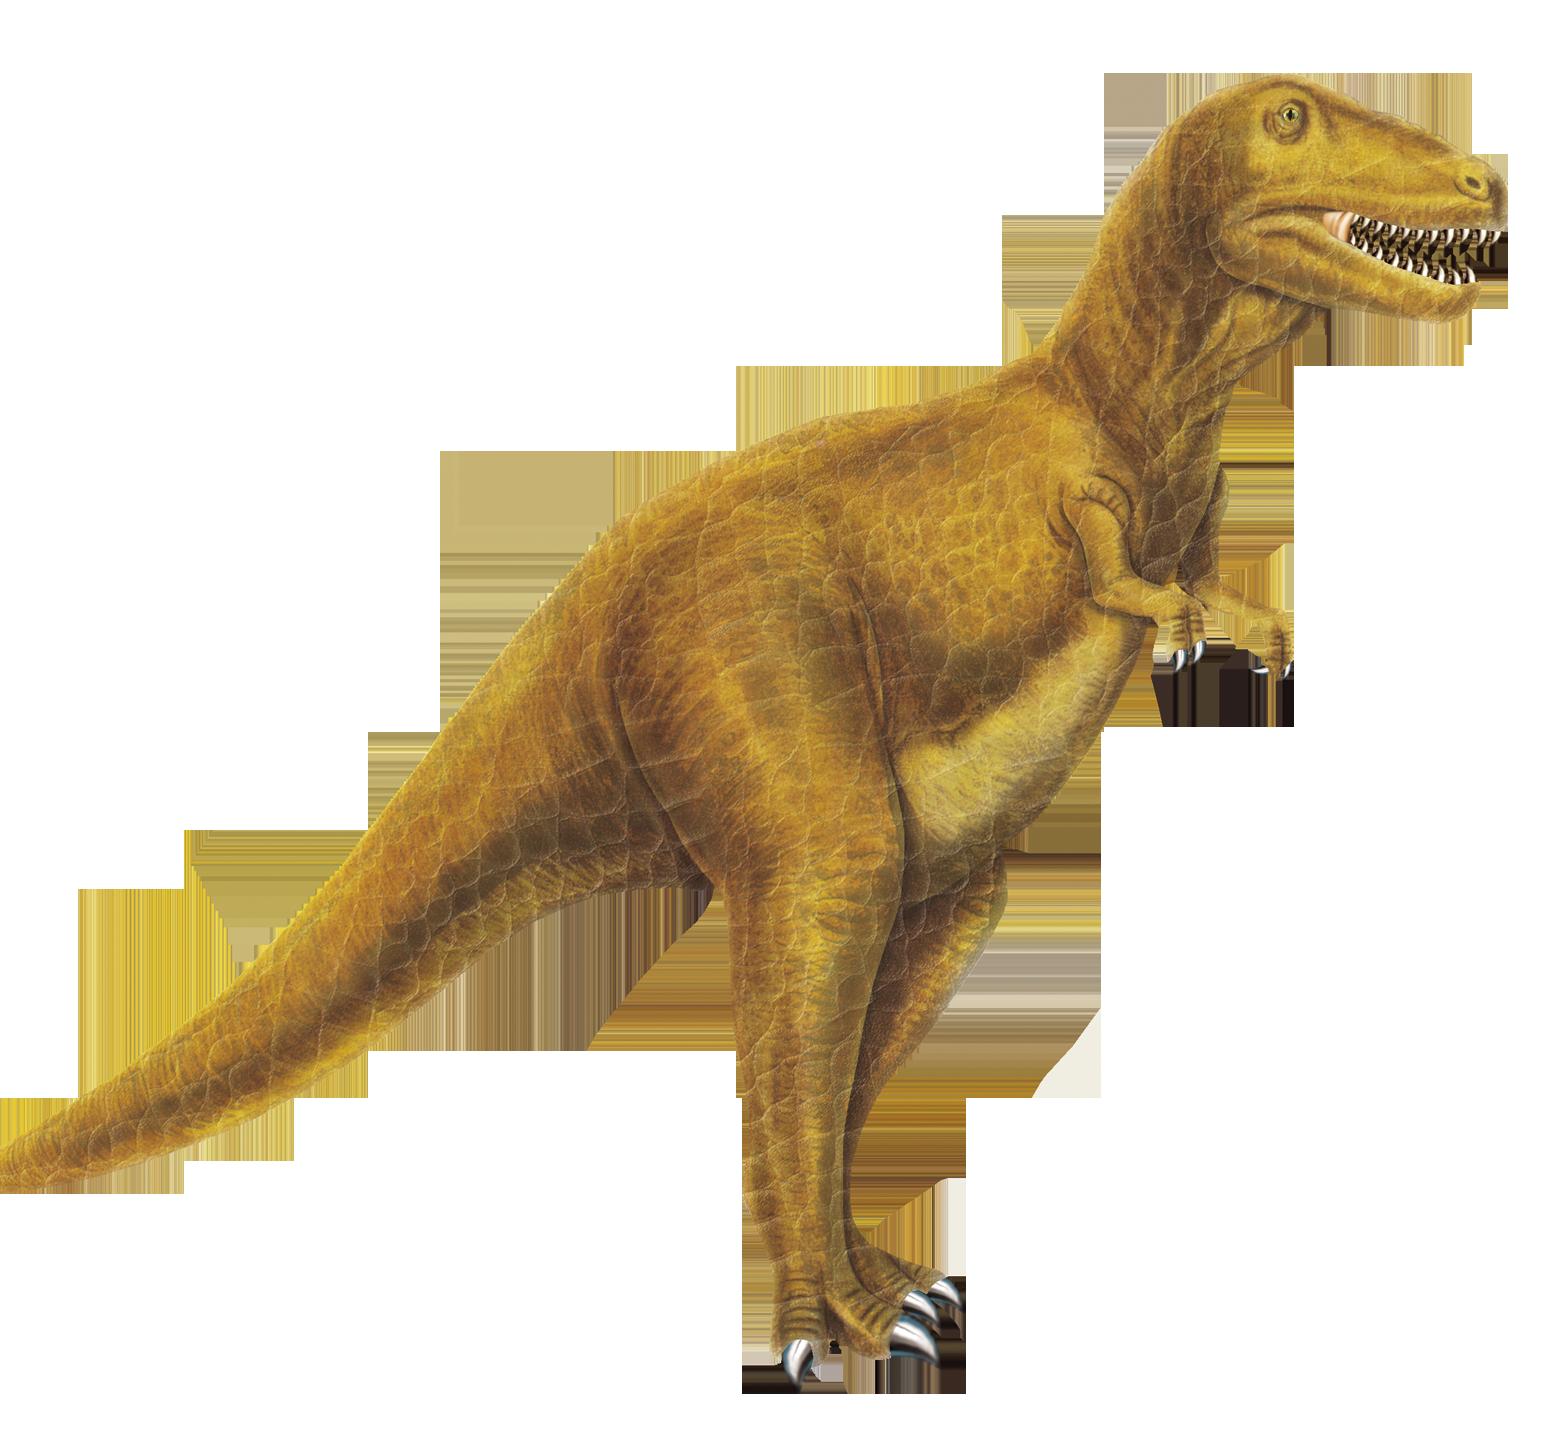 Dinosaur Images Free